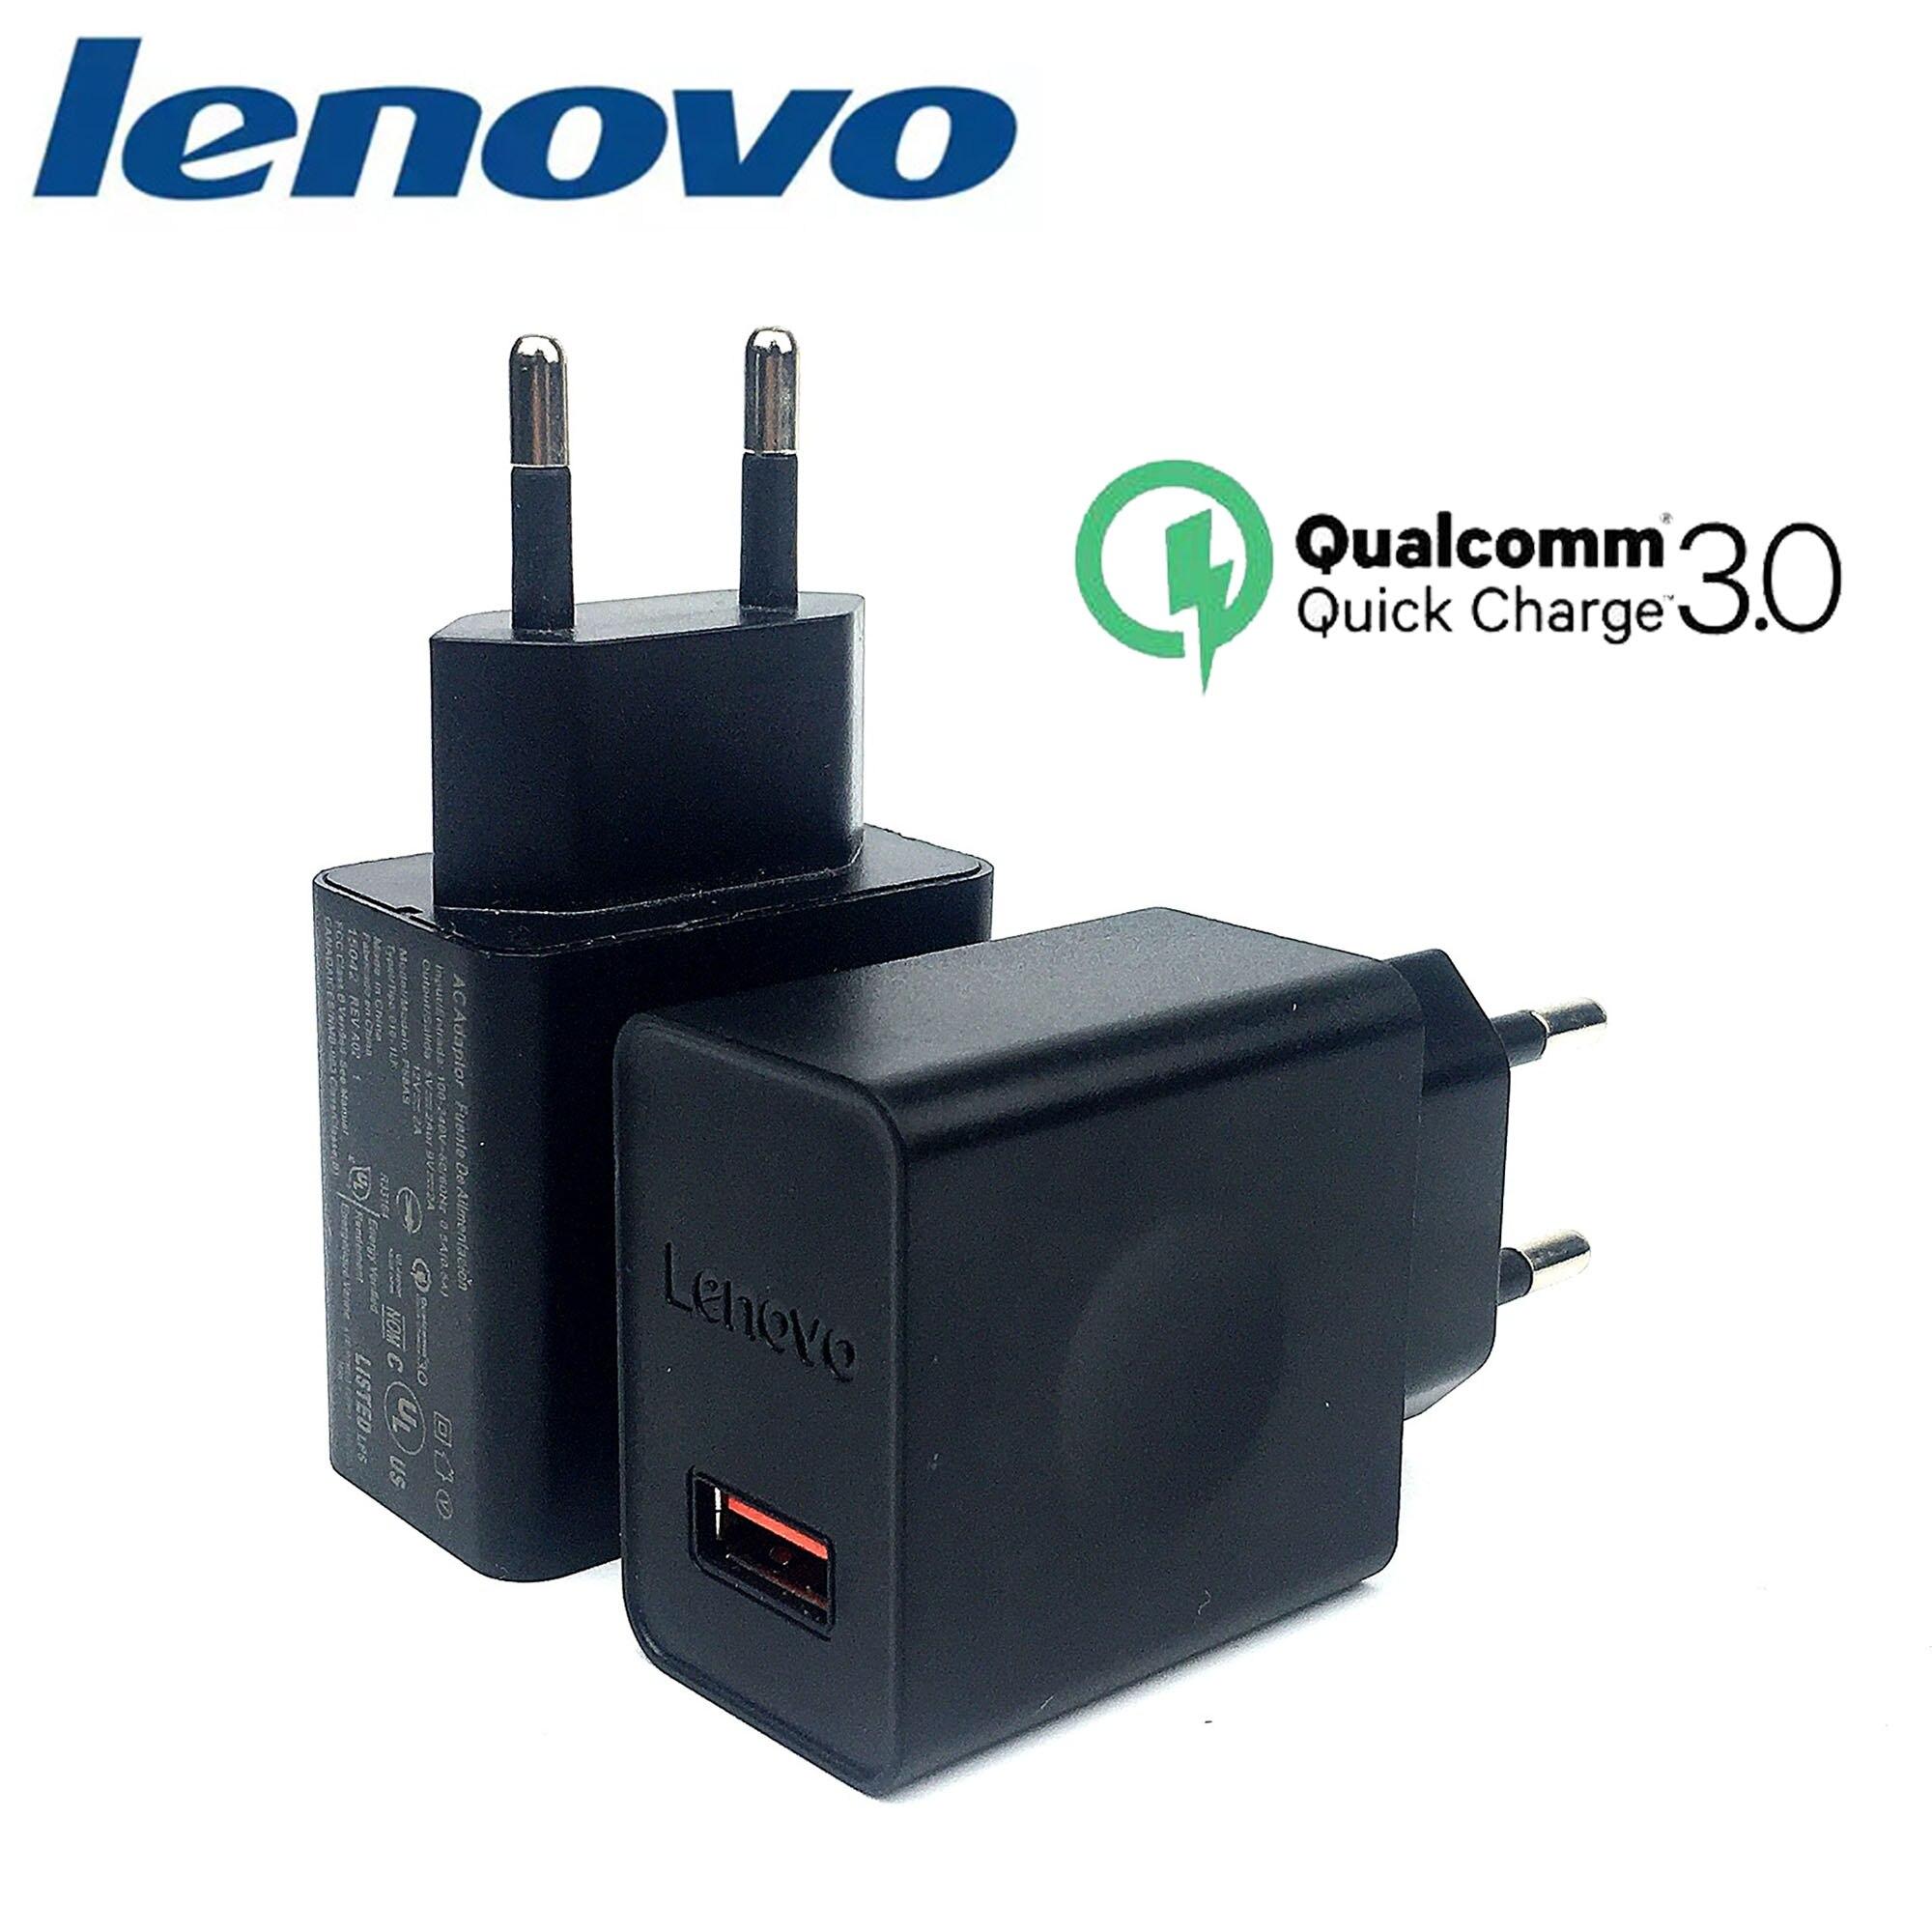 Lenovo 12V/2A cargador rápido QC 3,0 Original de carga rápida USB AC adaptador de enchufe para K5 jugar S5 Pro K6 a536 k3 nota p2 vibe p1 p780